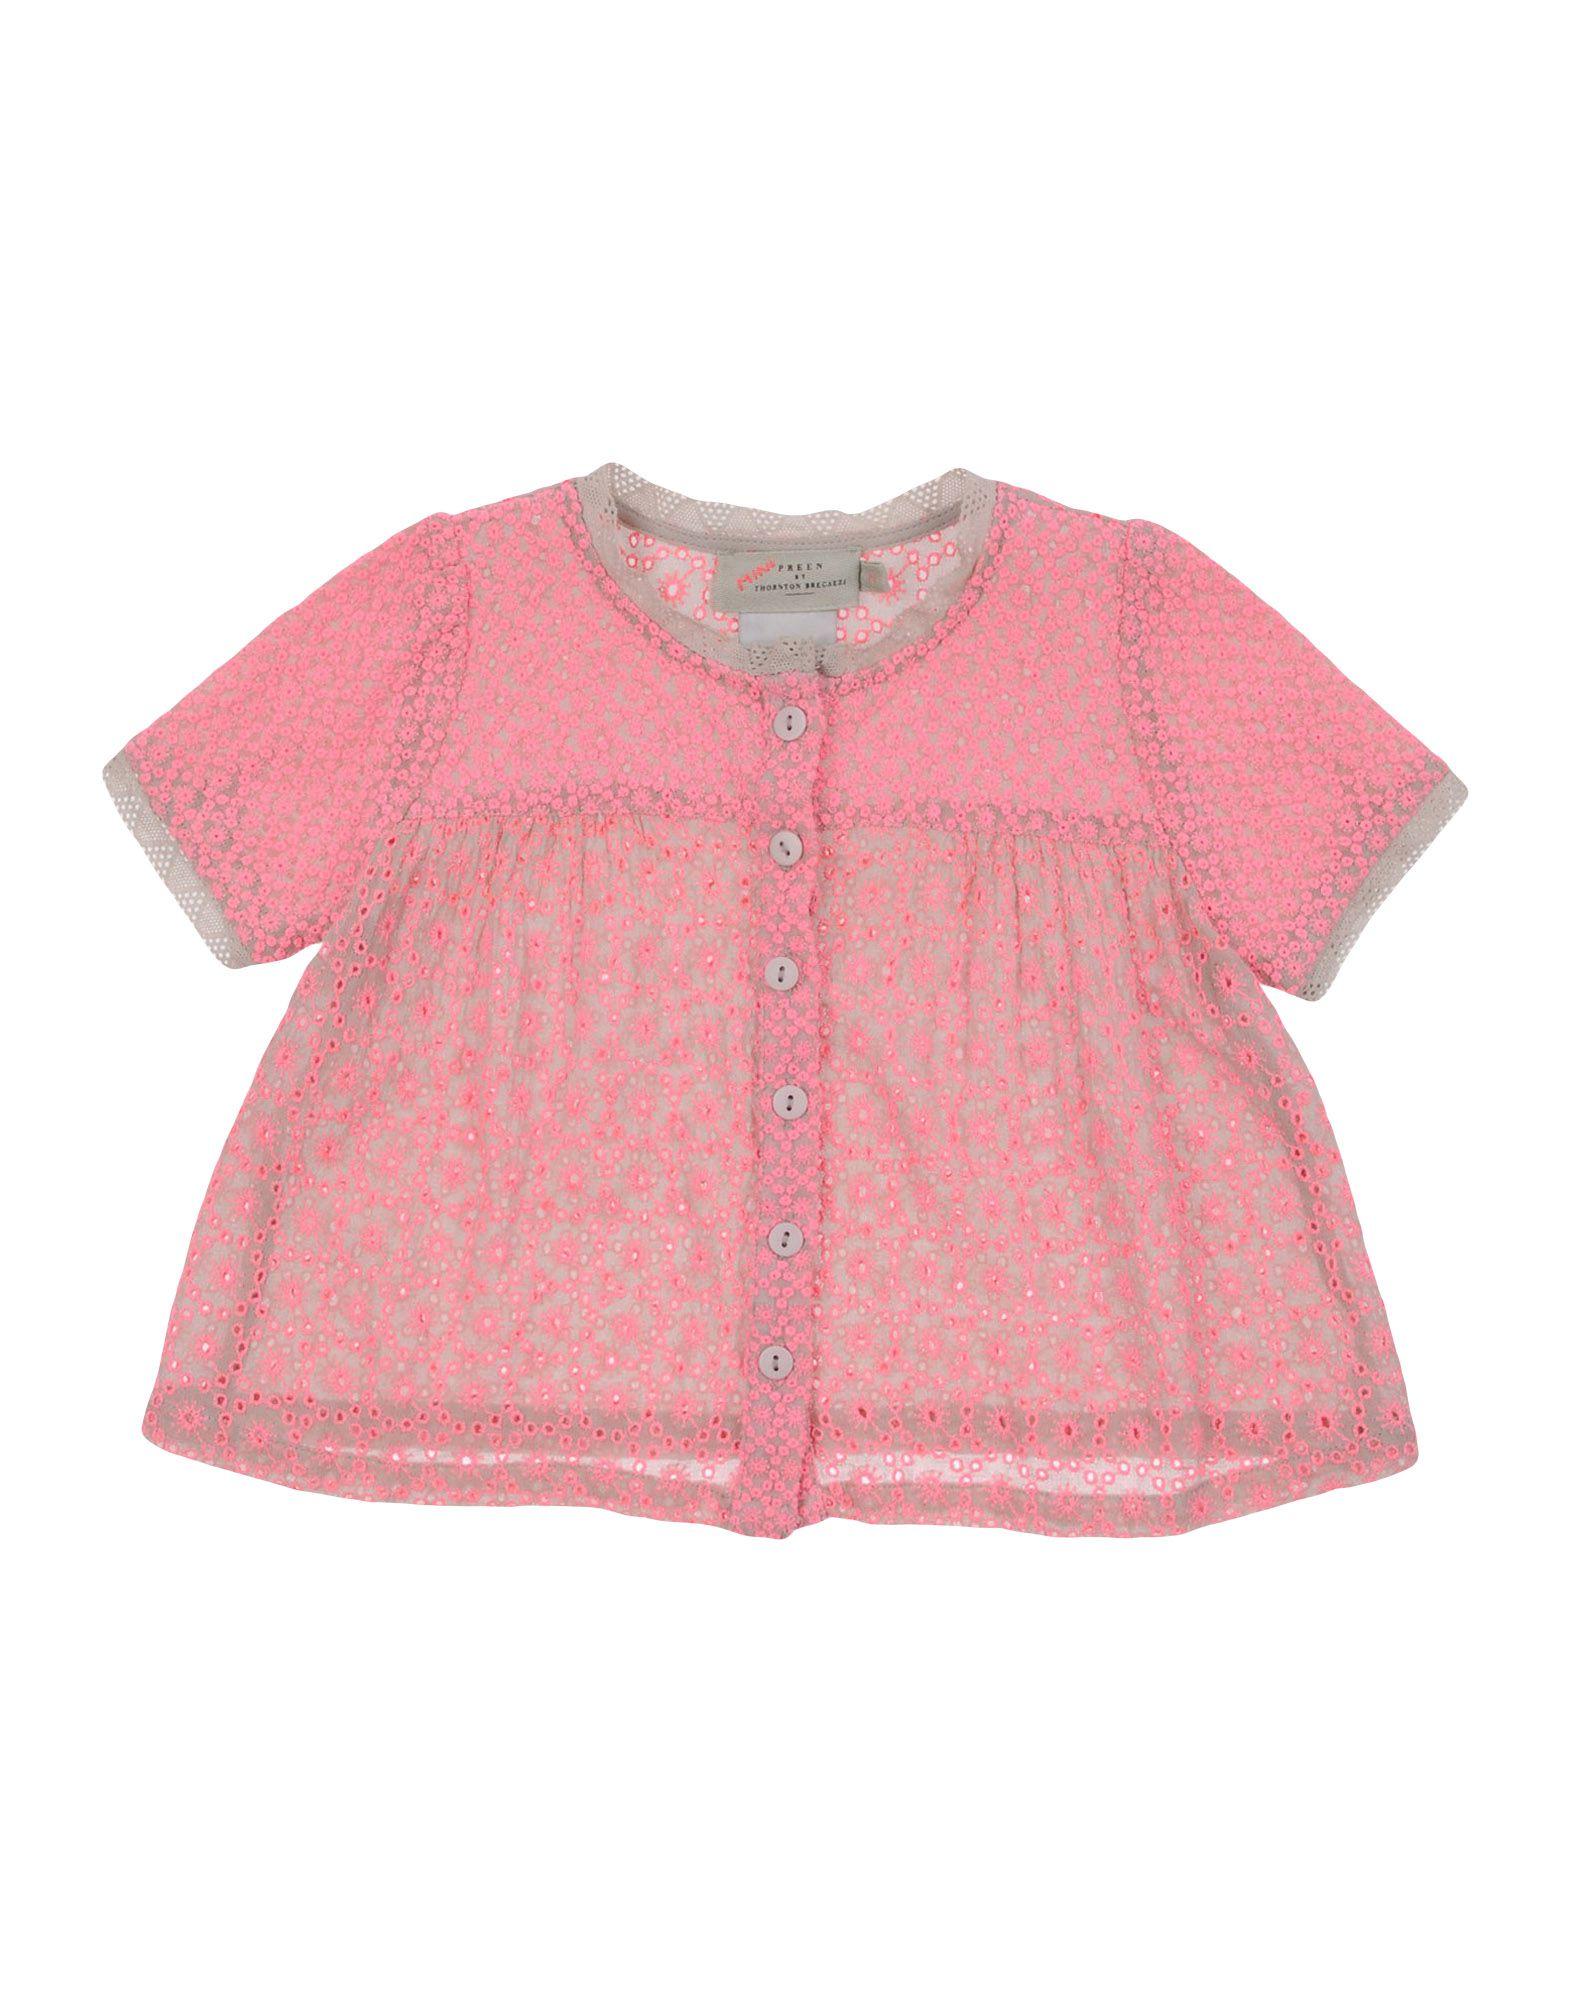 PREEN by THORNTON BREGAZZI Mädchen 0-24 monate Hemd Farbe Rosa Größe 10